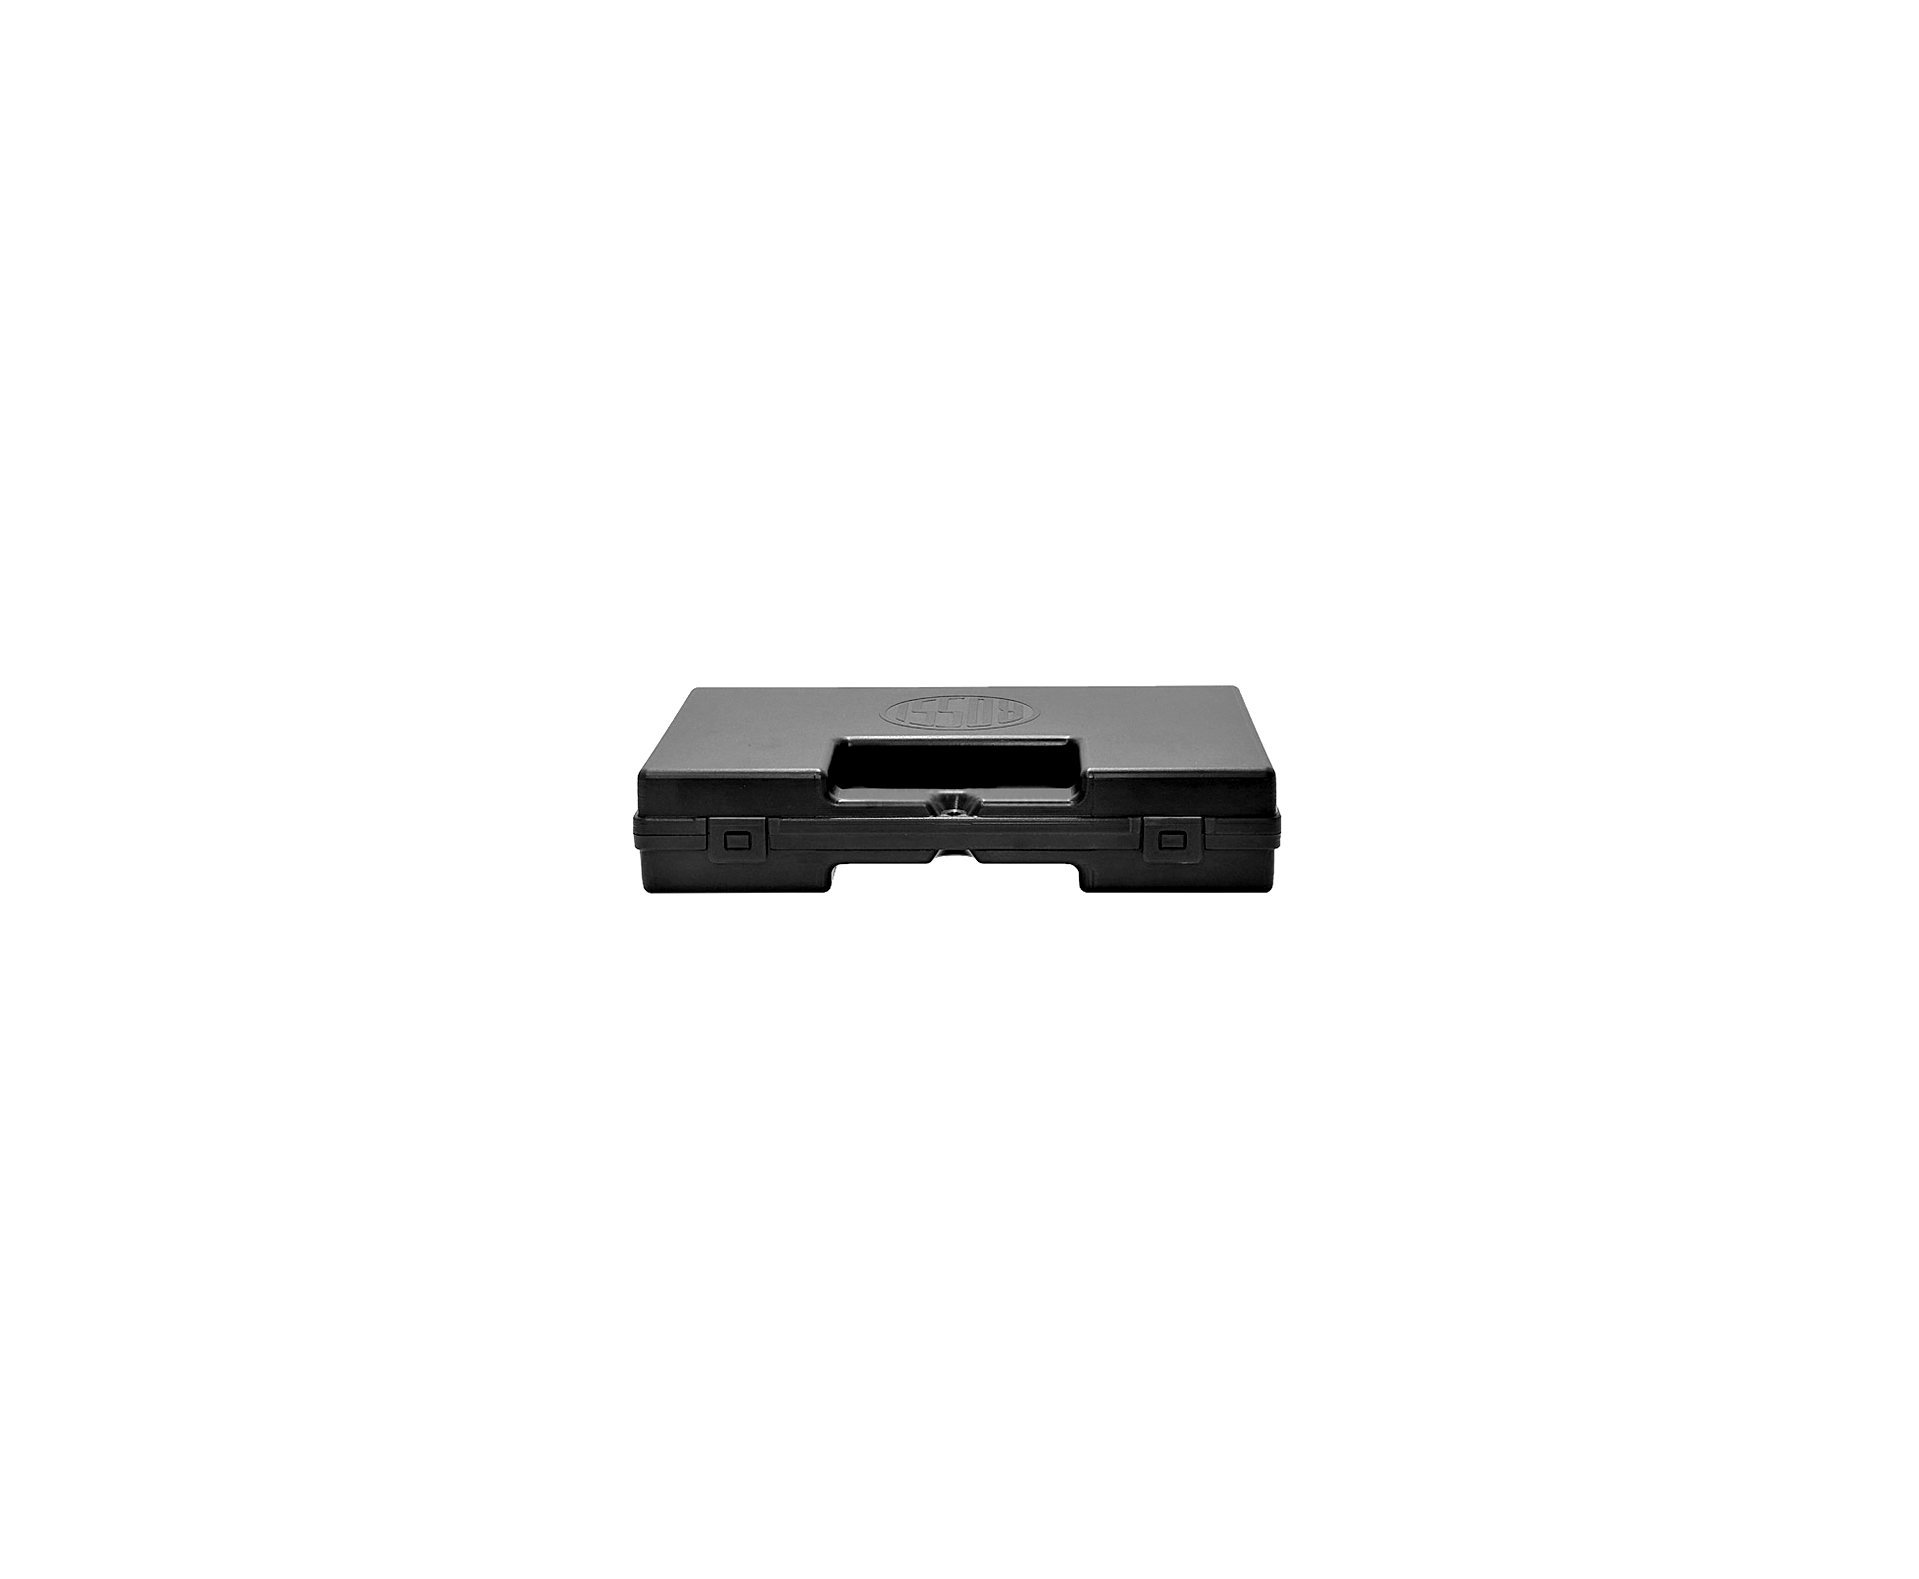 Pistola De Airsoft Aeg Hk Usp Tactical Semi/metal - Cal 6,0 + 4000 Esferas 0,20g + Case Deluxe - Umarex